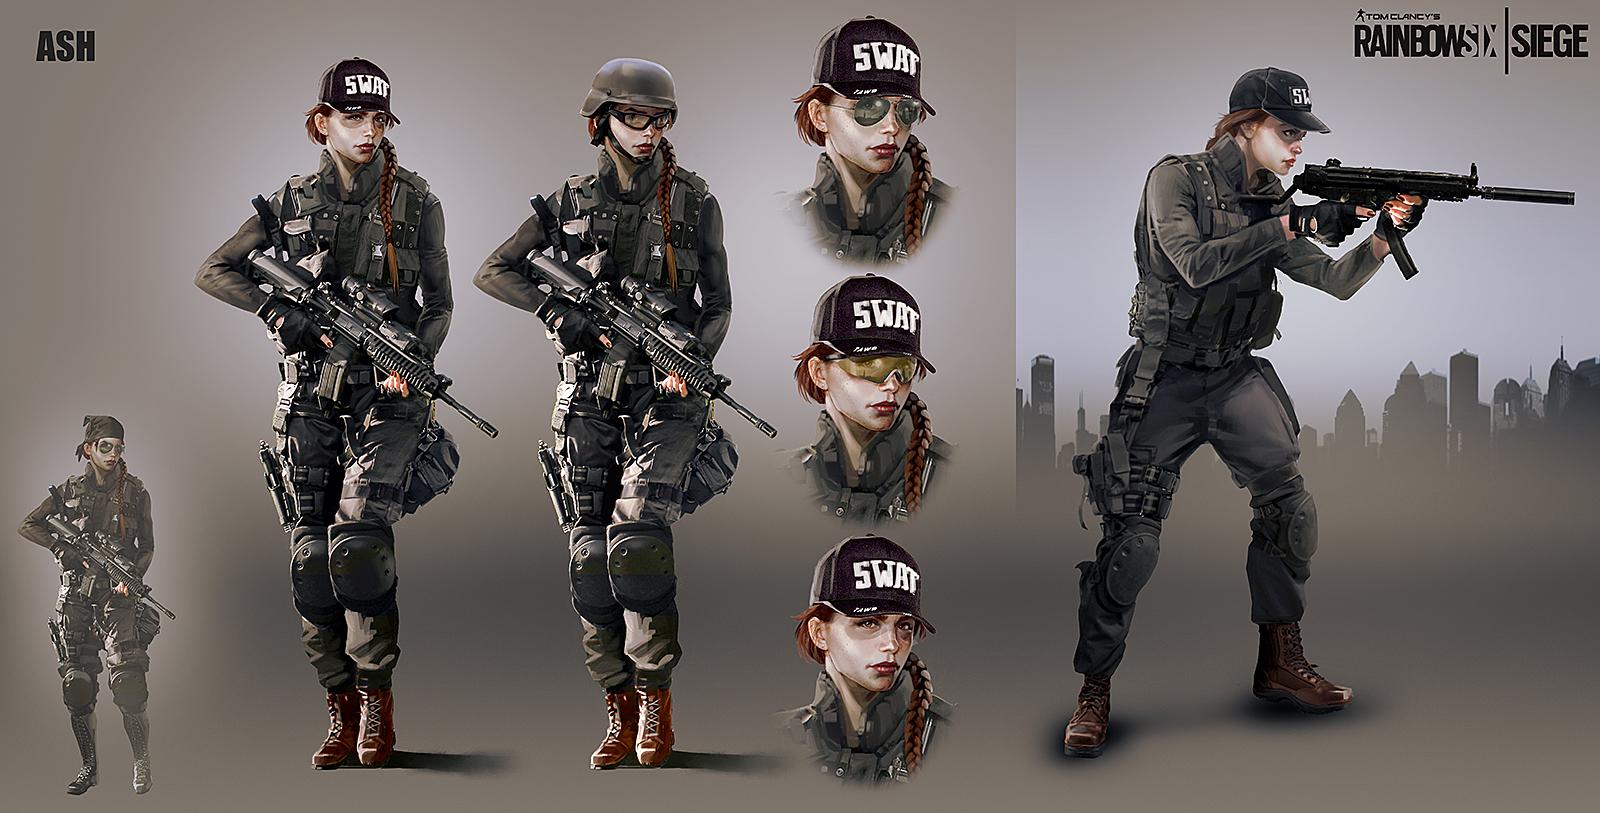 3d comic six gun sisters episode 5 8